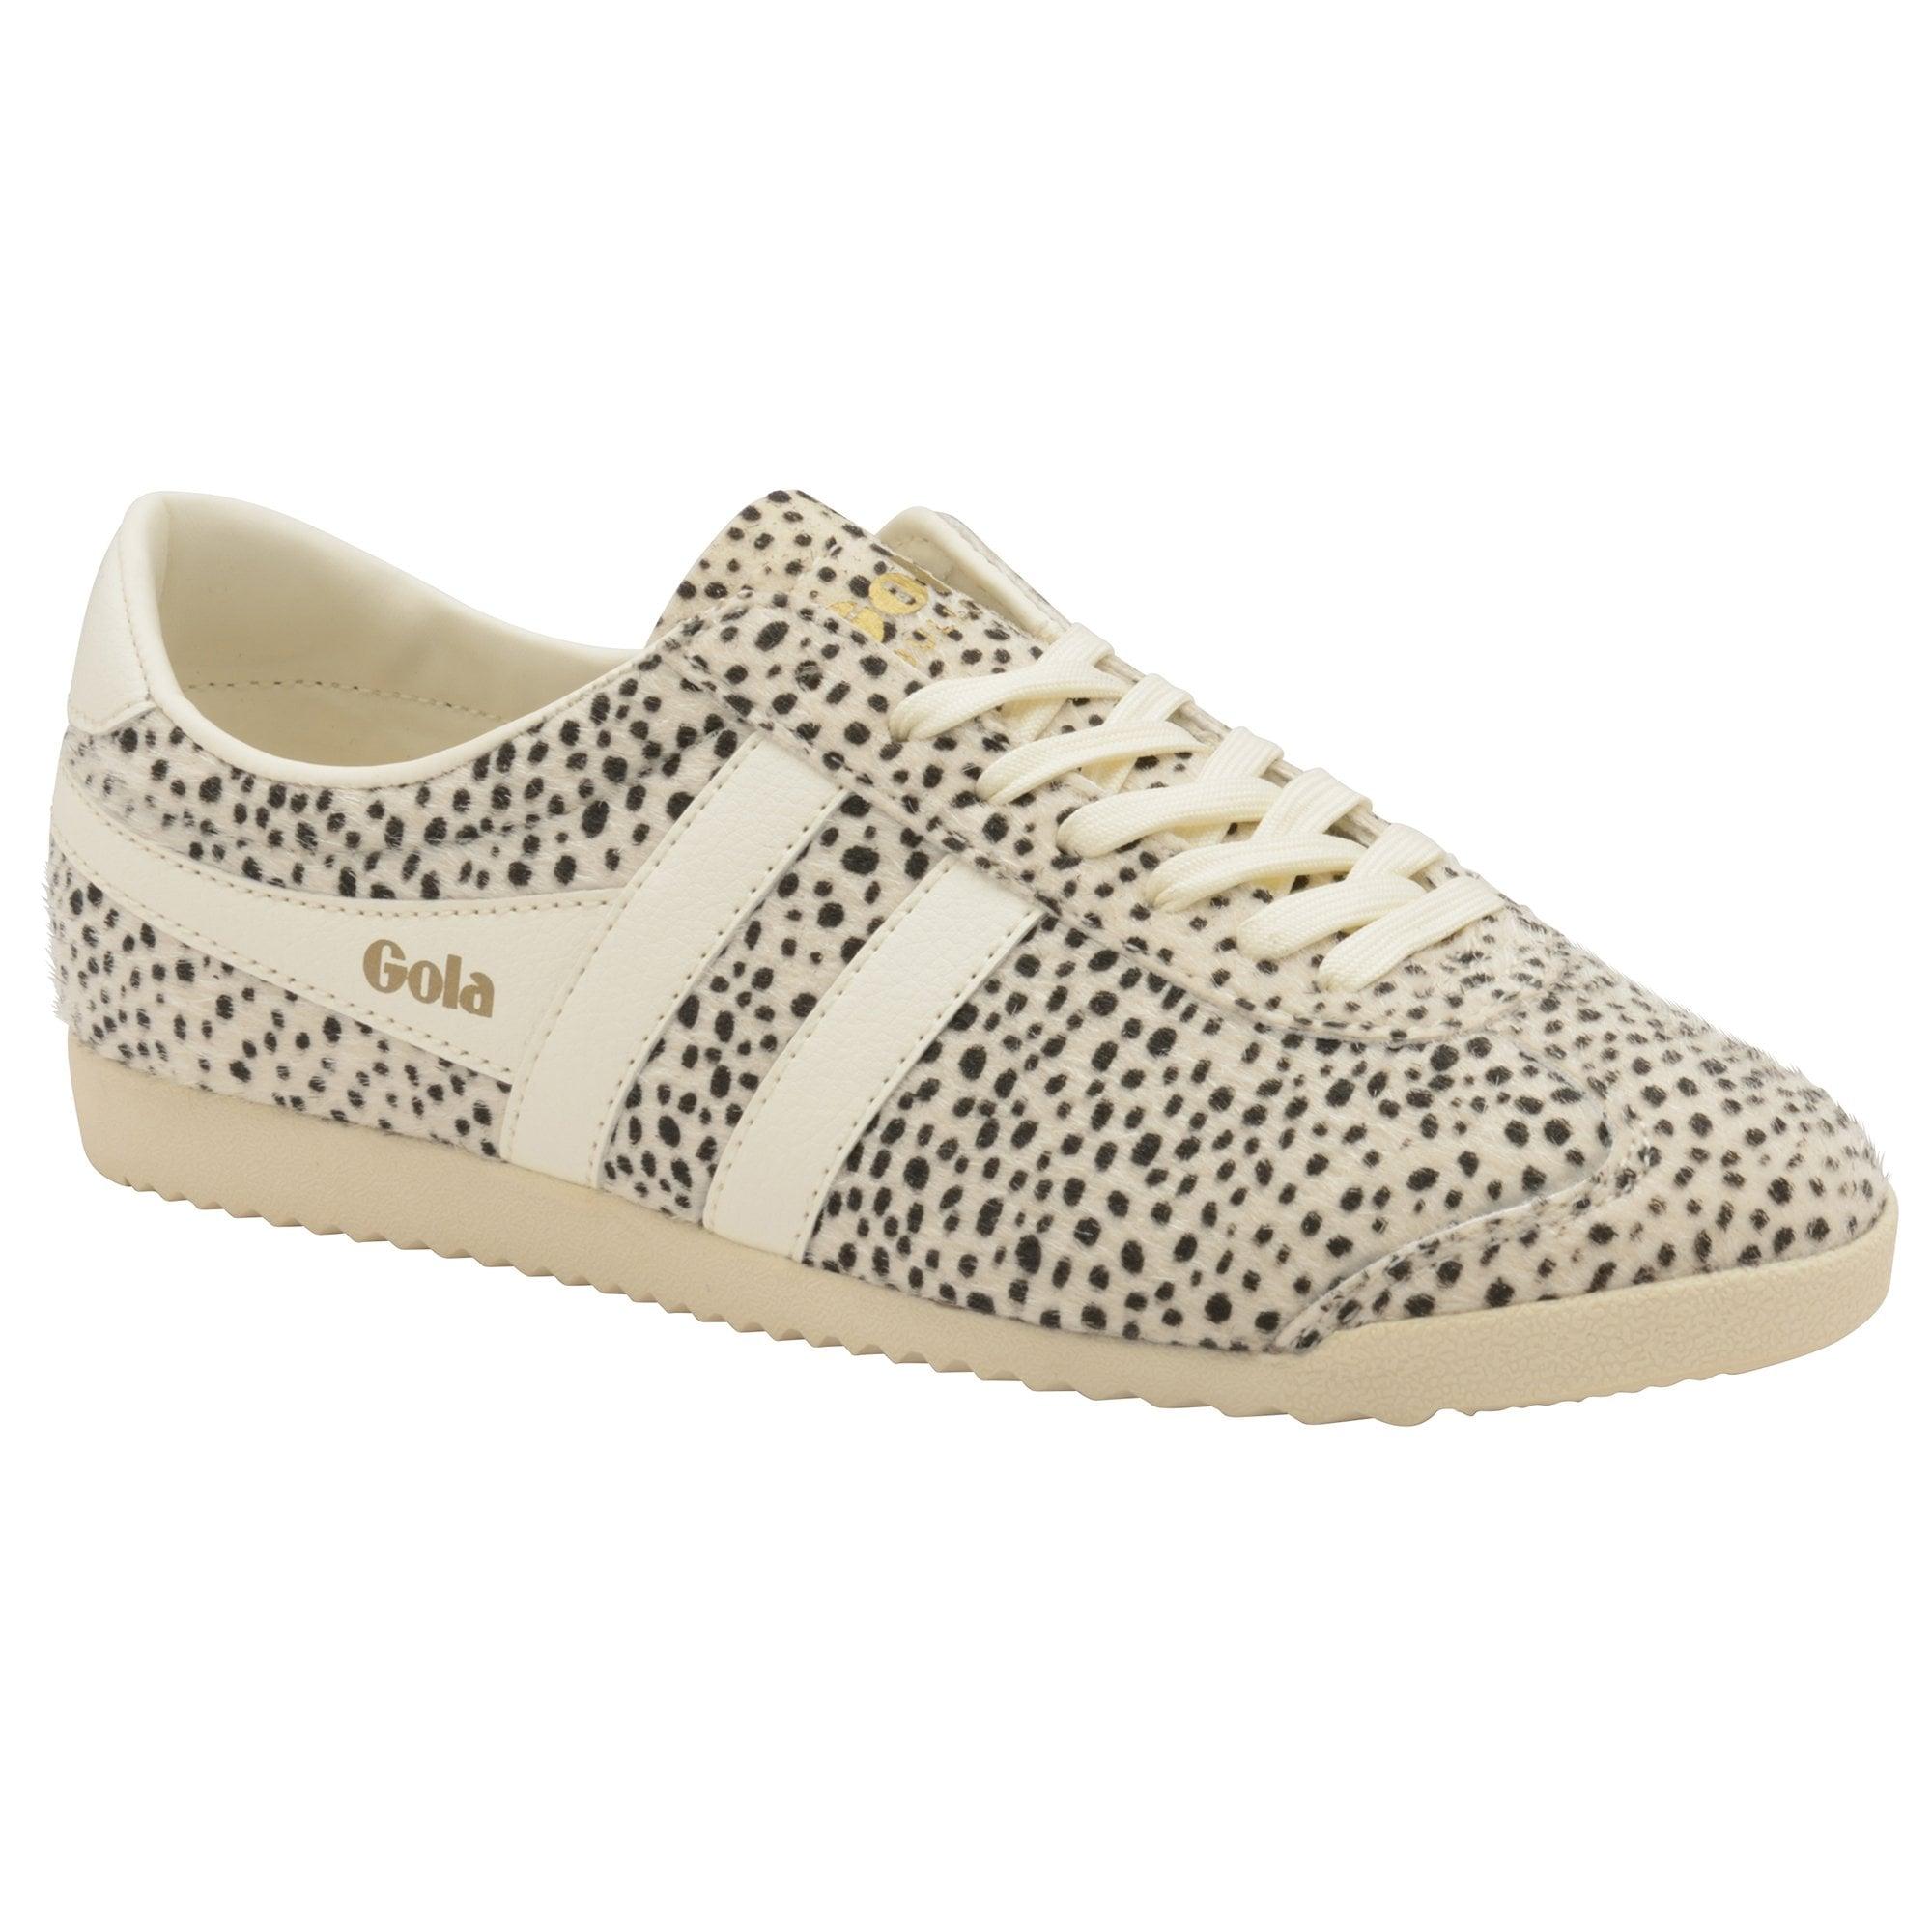 Buy Gola womens Bullet Cheetah sneaker